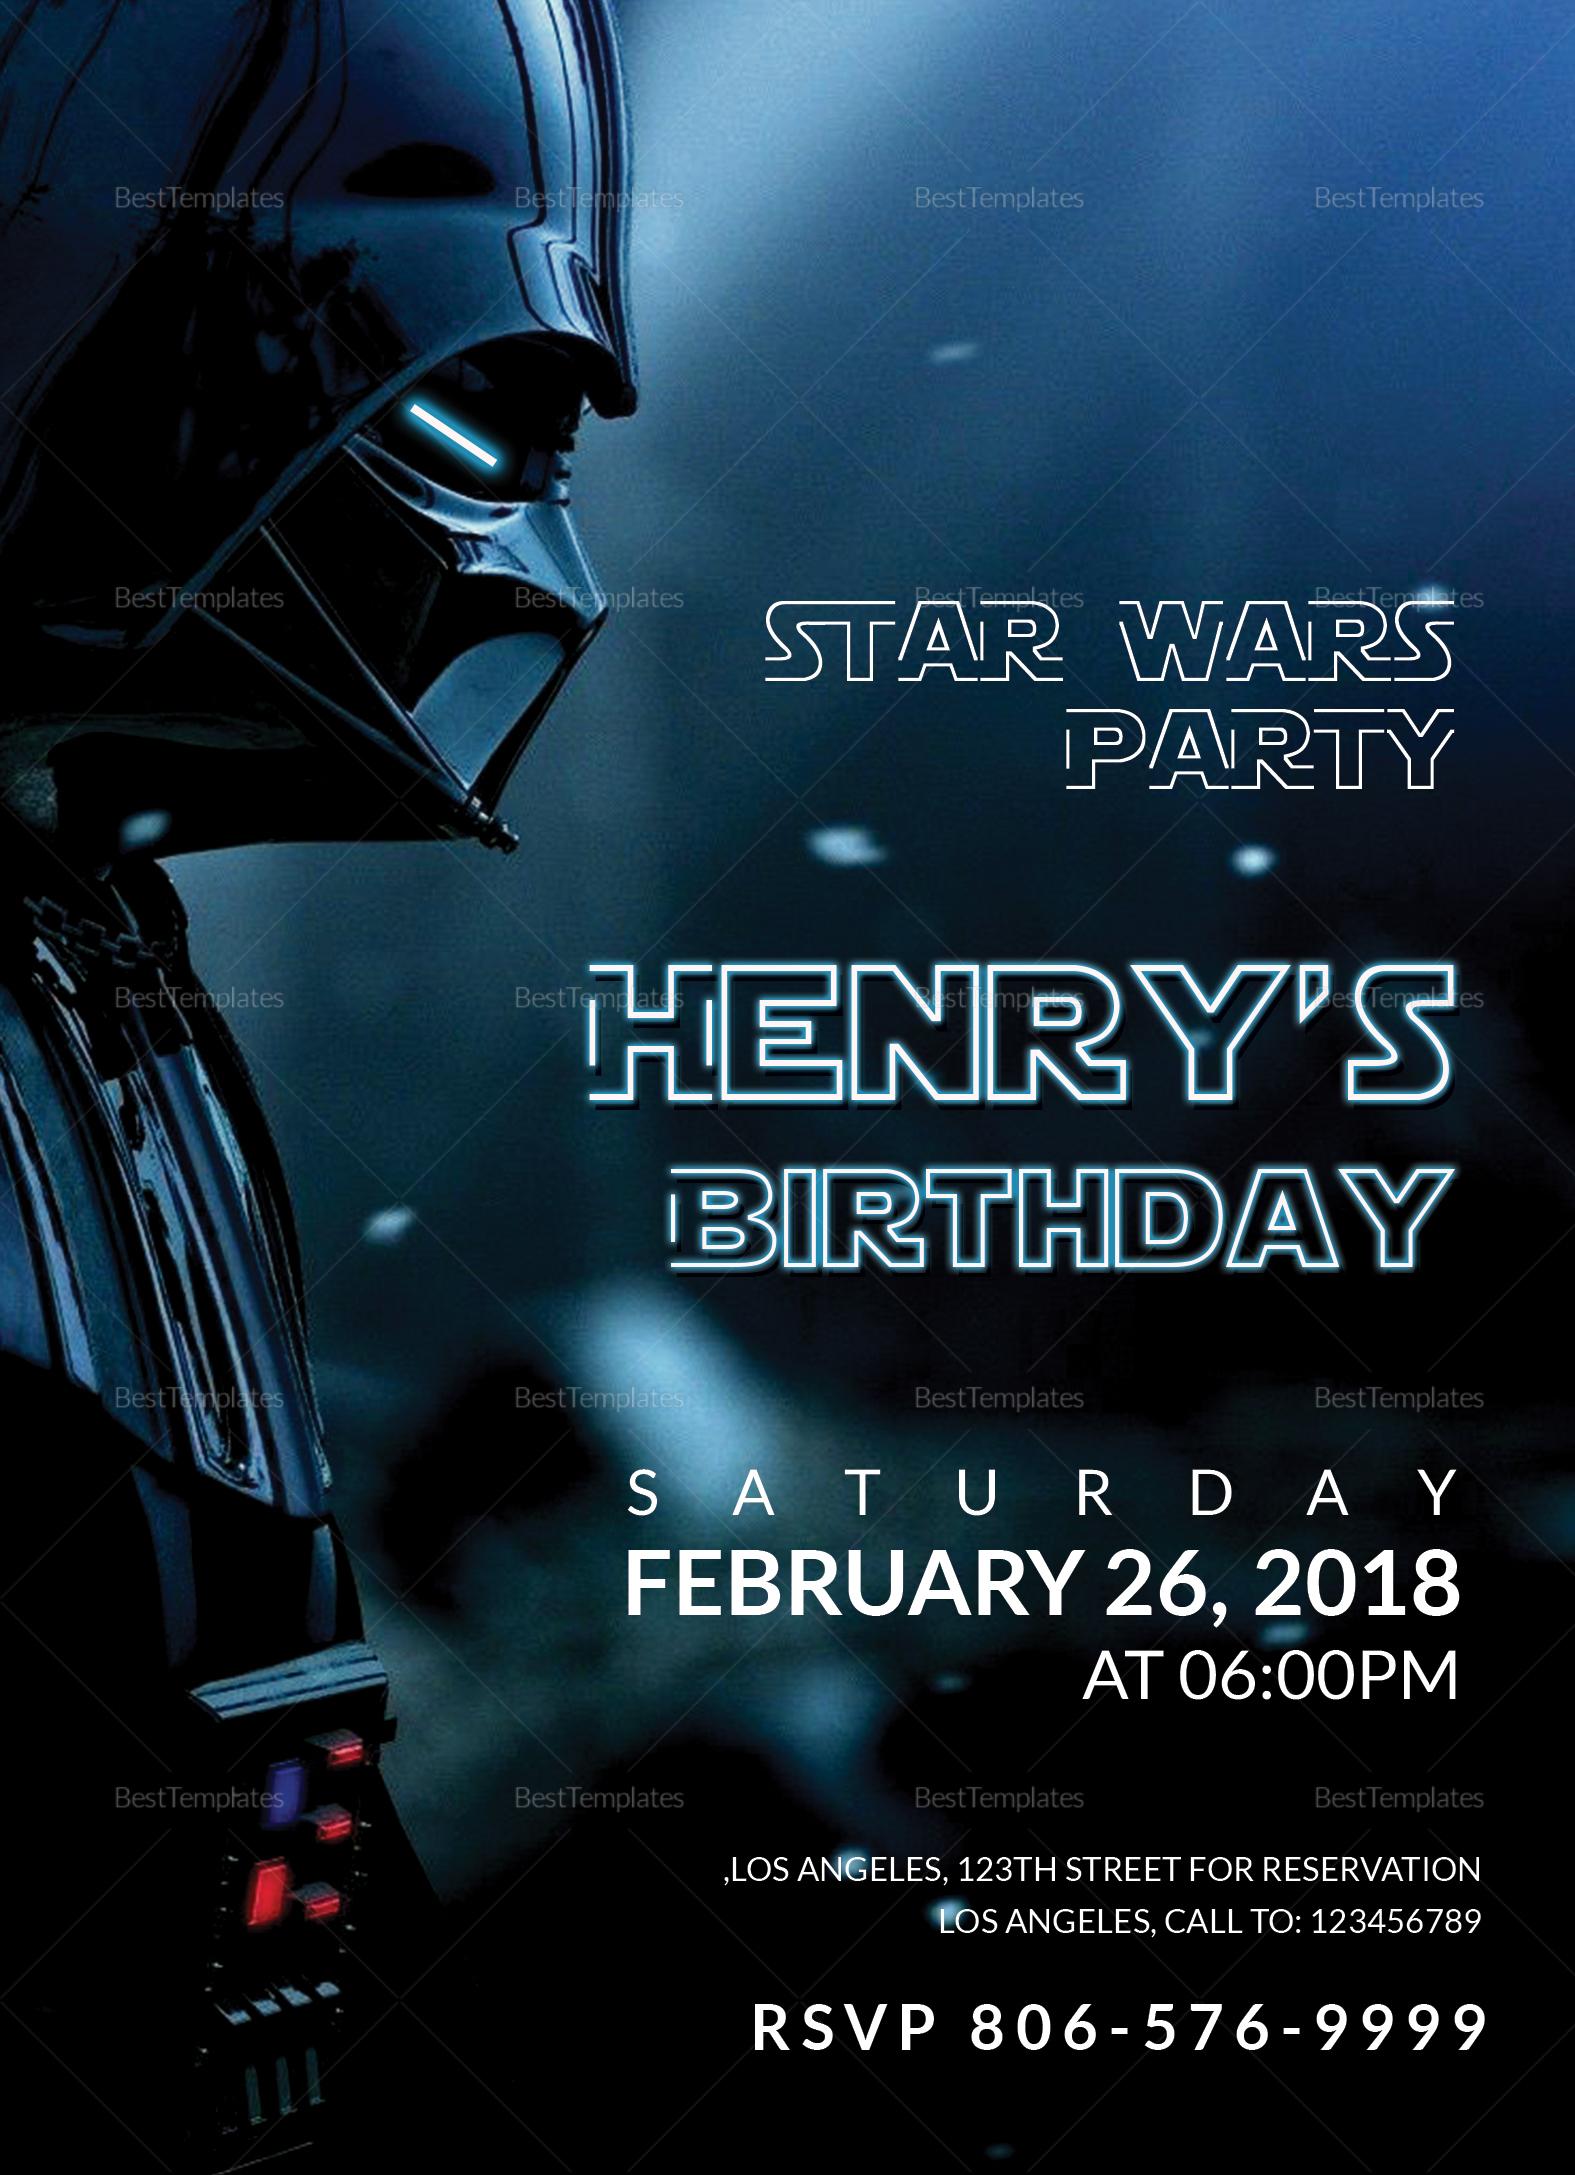 Star Wars Birthday Party Invitation Design Template